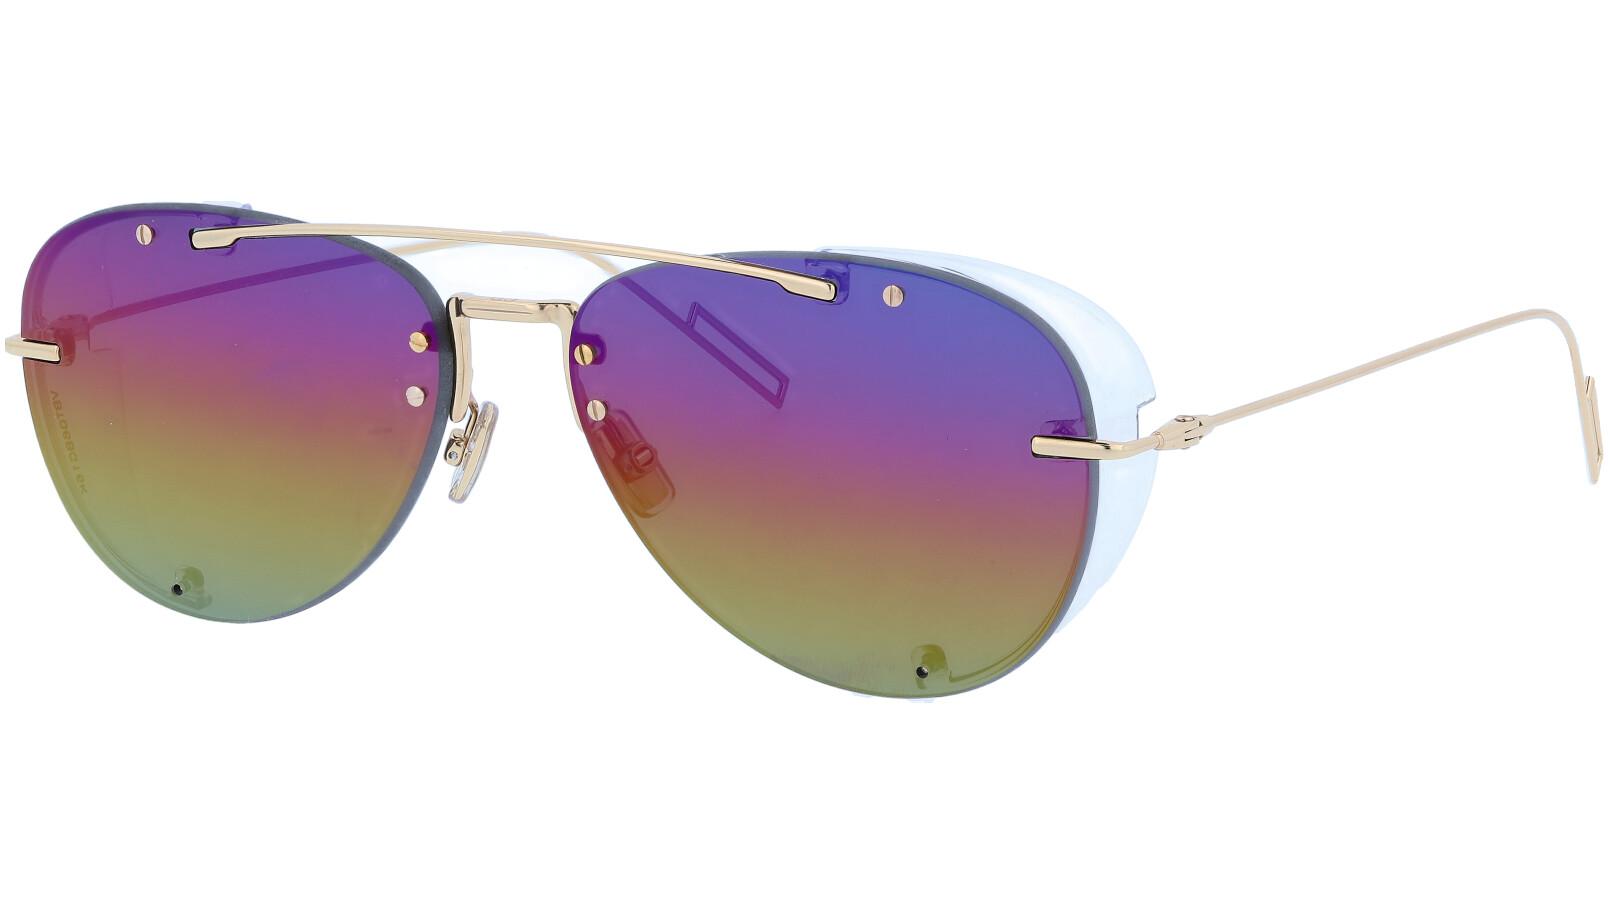 DIOR DIORCHROMA1 J5GR3 59 GOLD Sunglasses